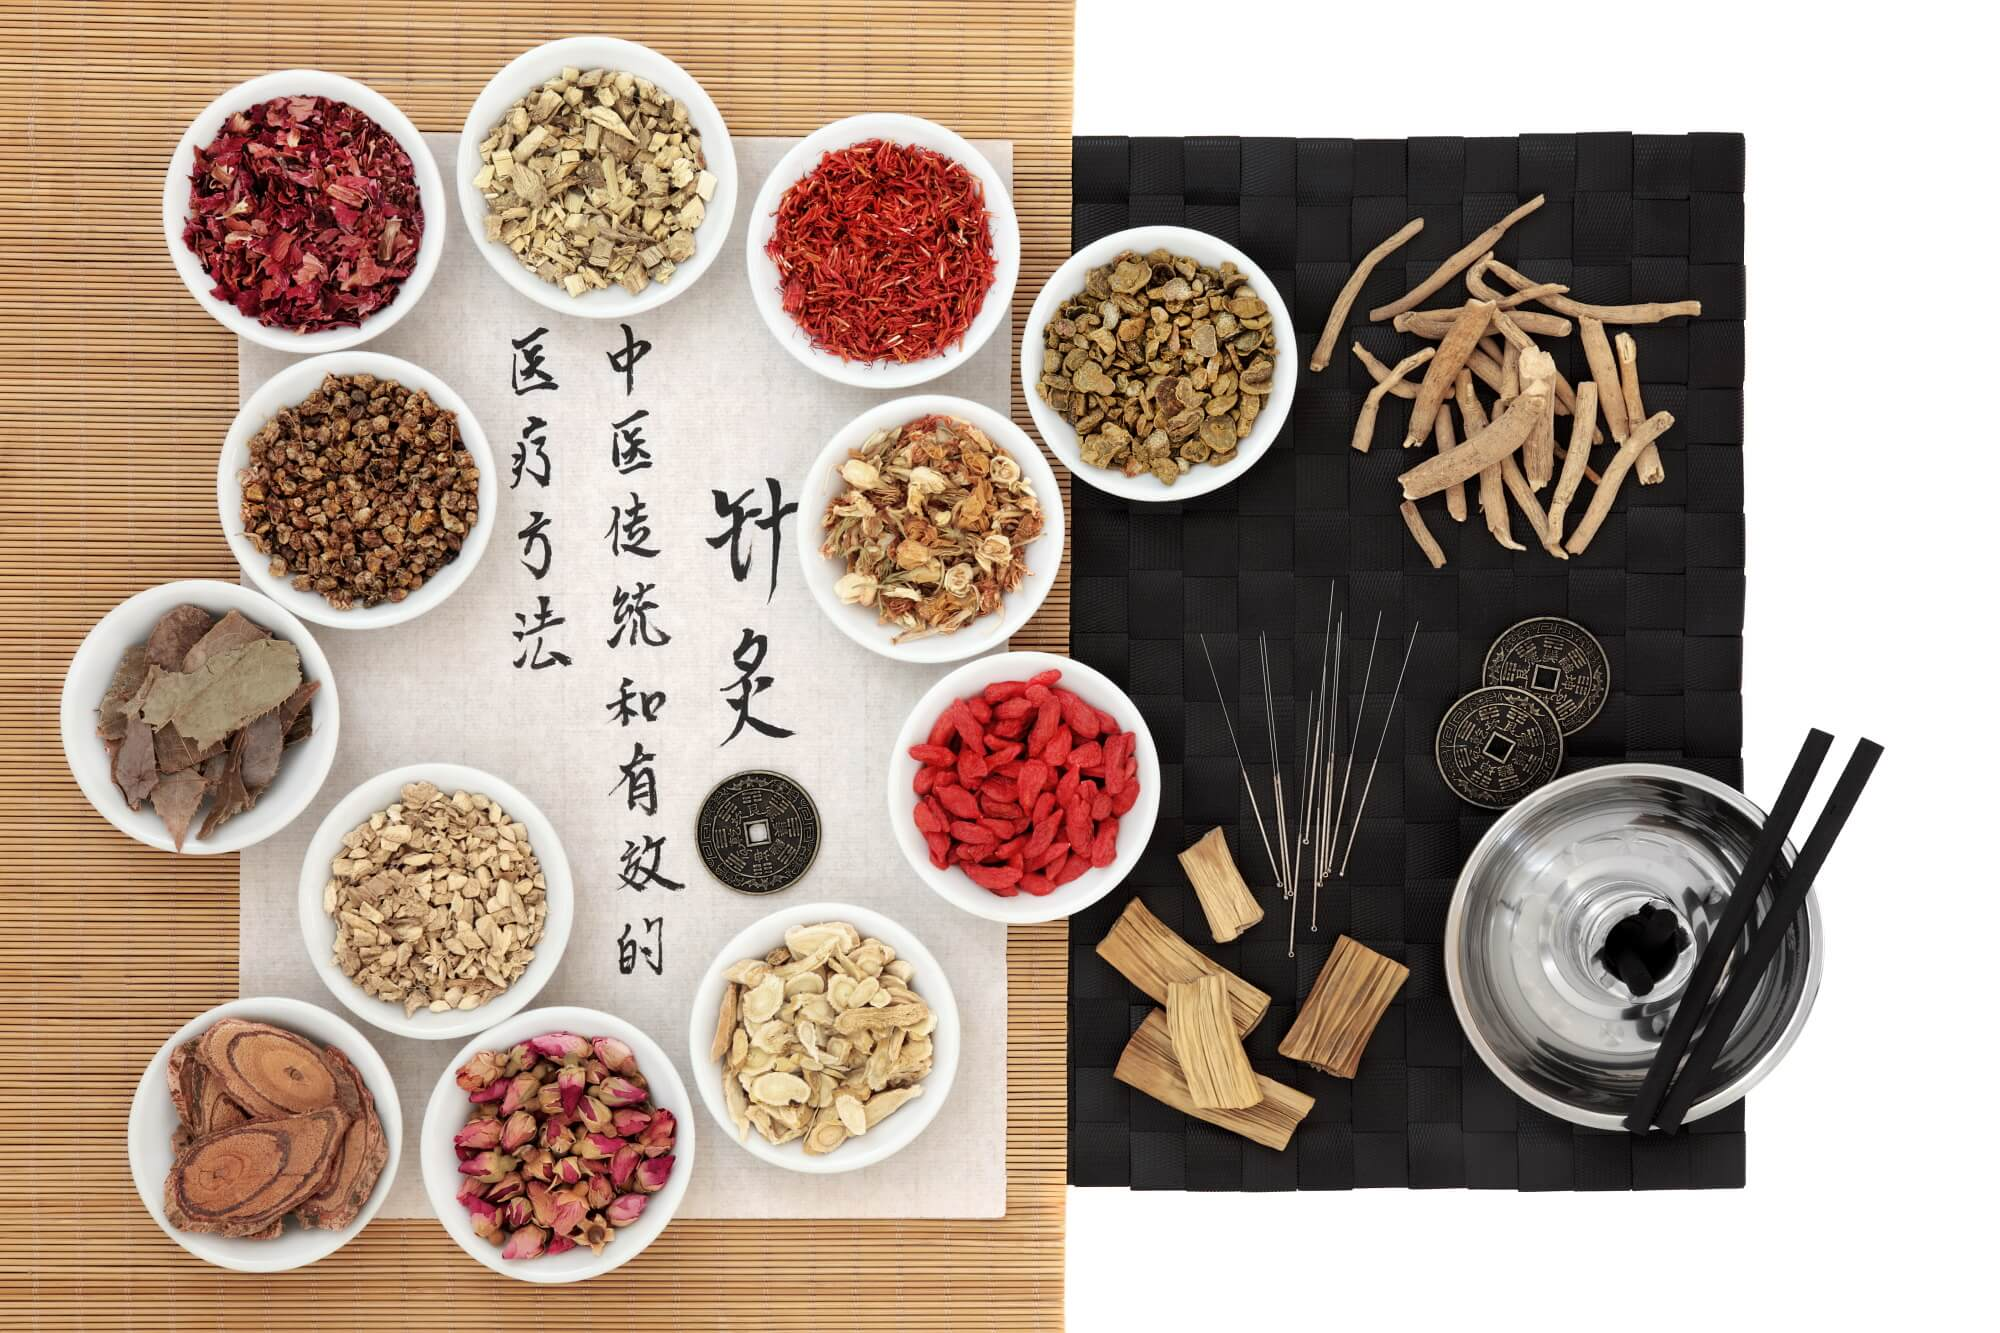 Chinese Medicine Seattle